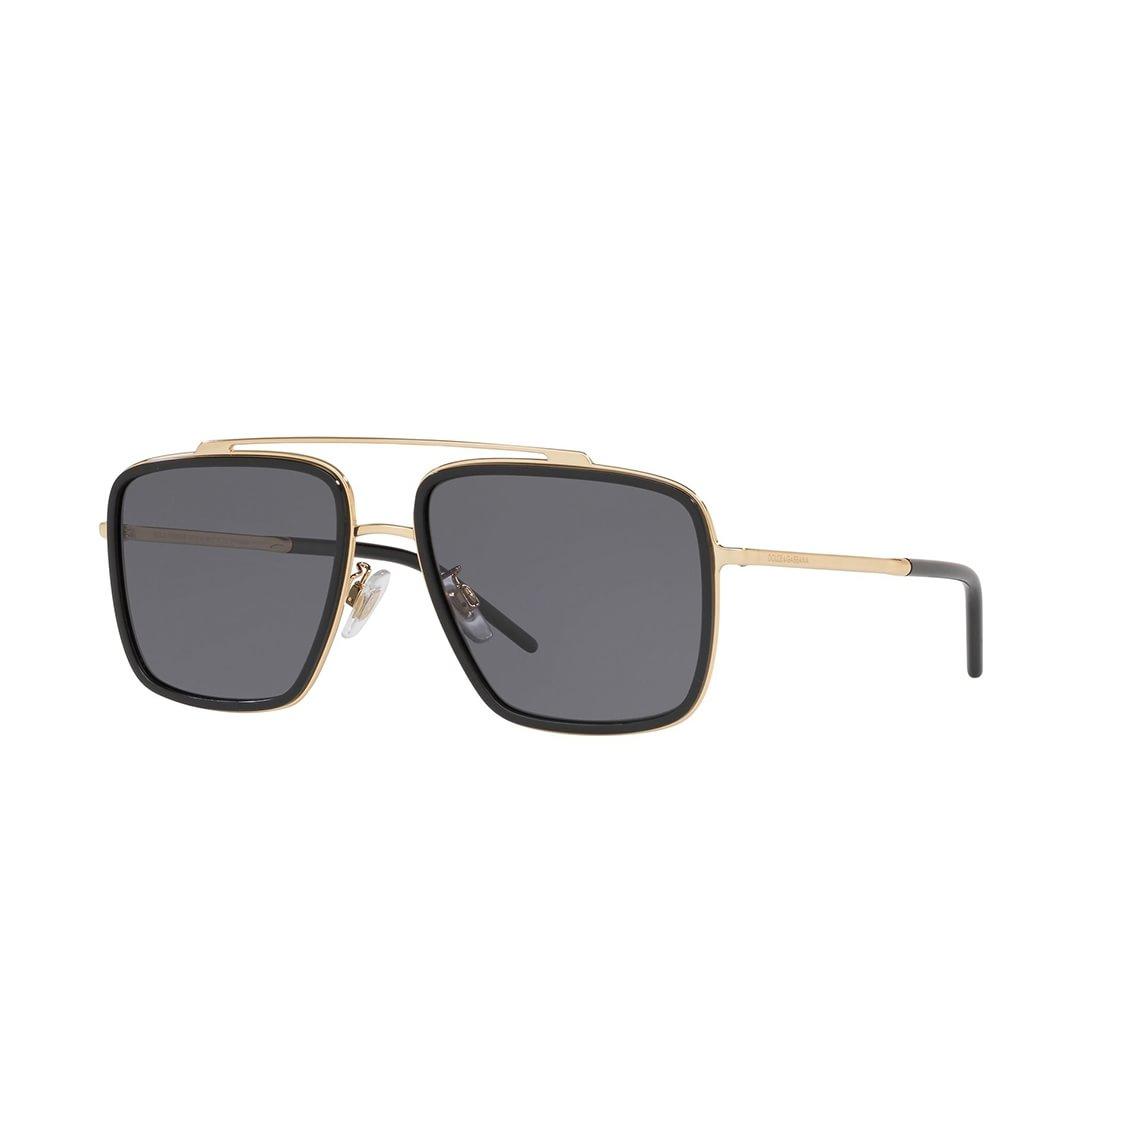 8d1e1b839d9c Dolce   Gabbana 0DG2220 57 02 81 - Profil Optik